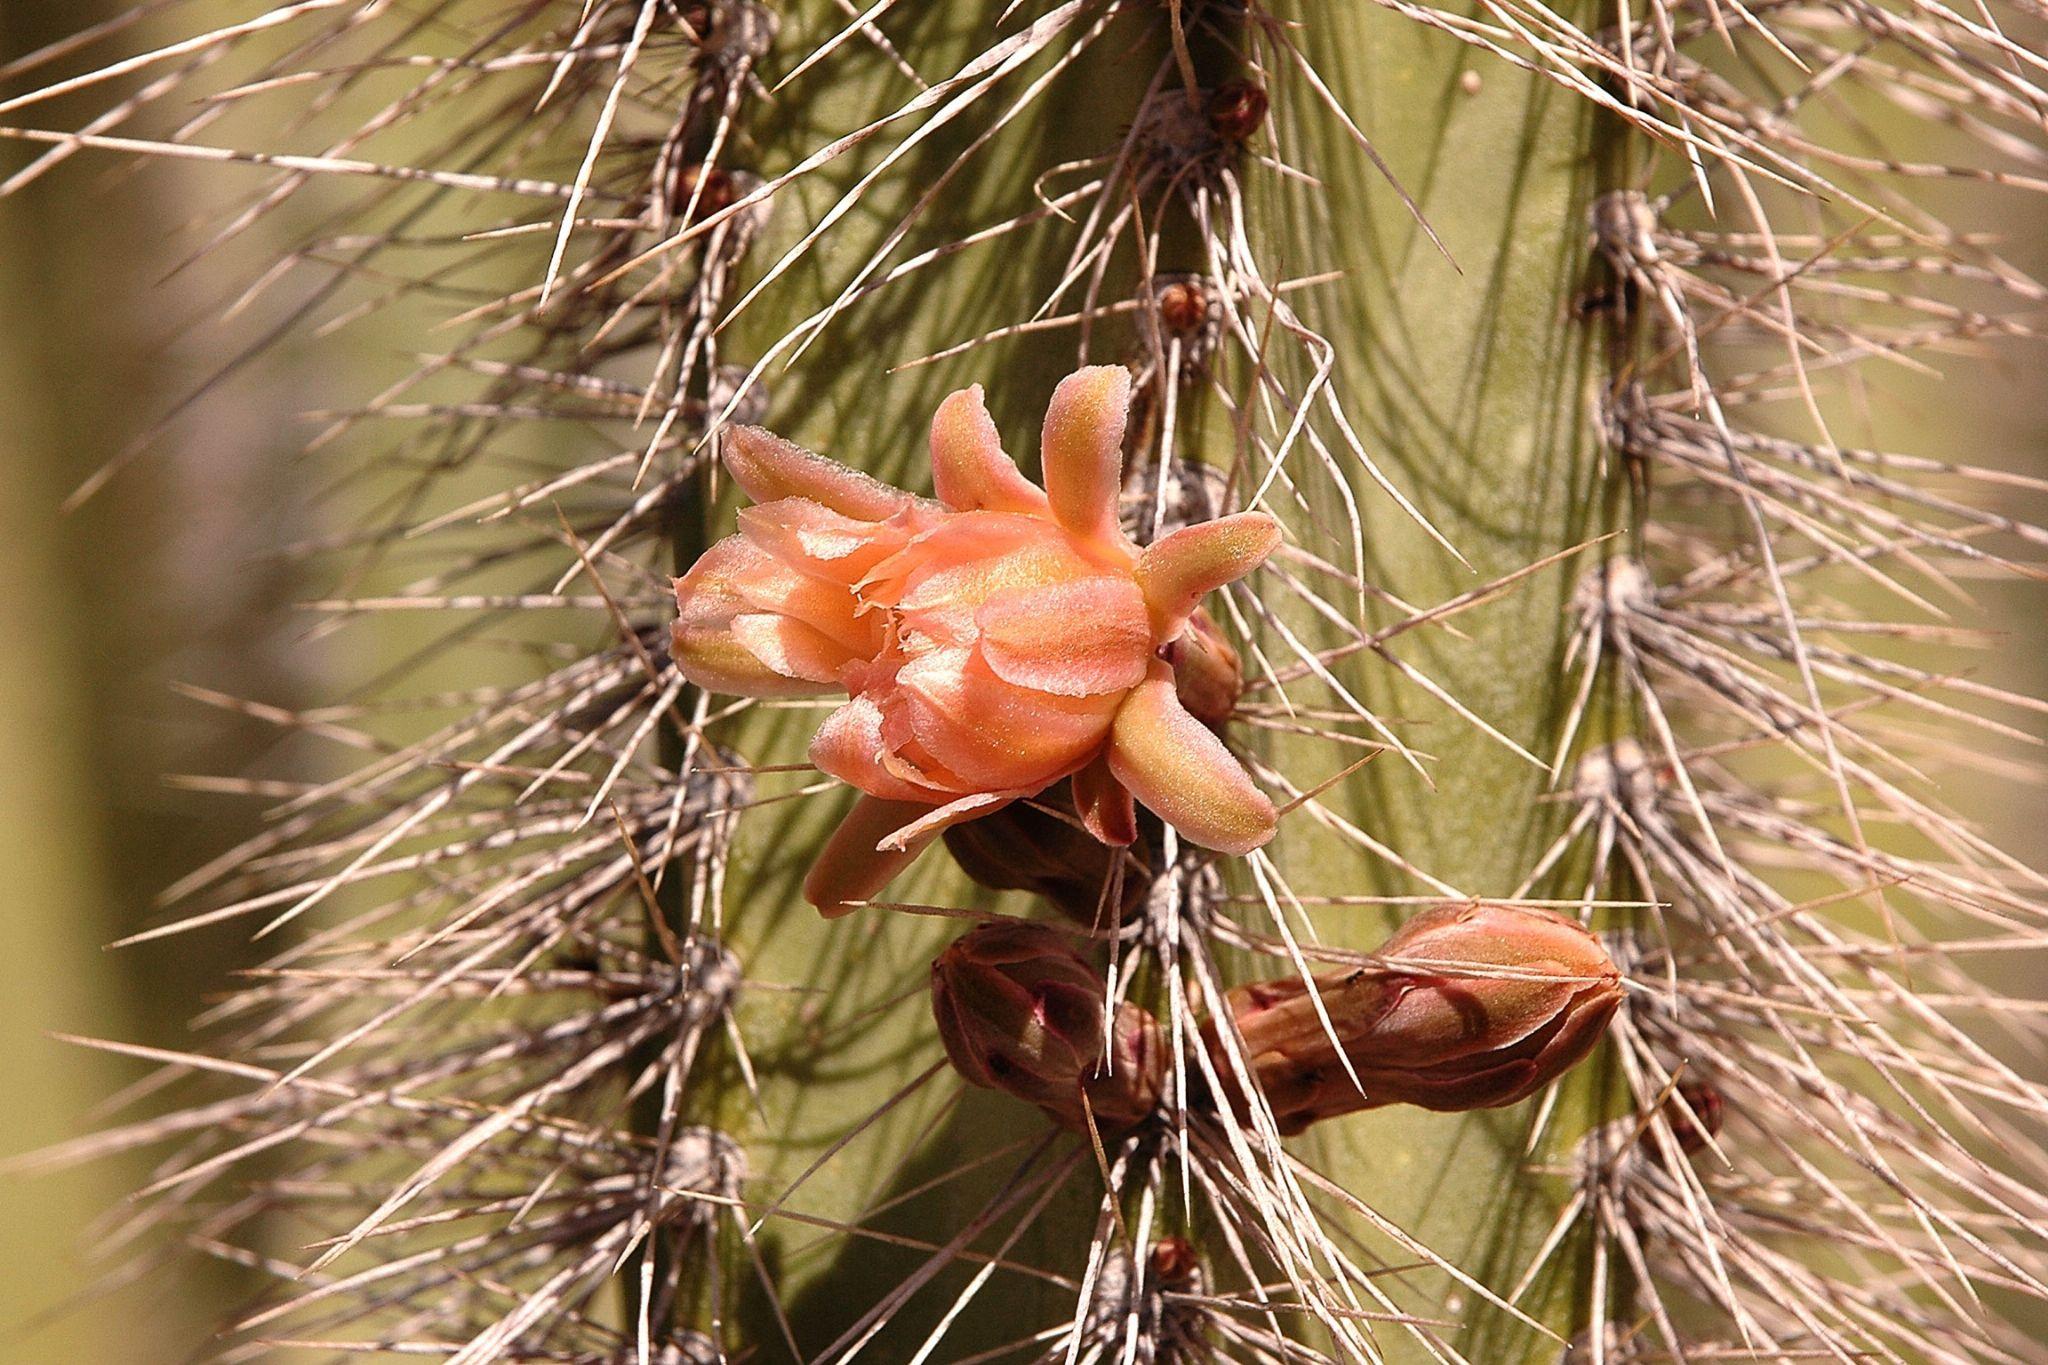 Cactus by Richard Hood